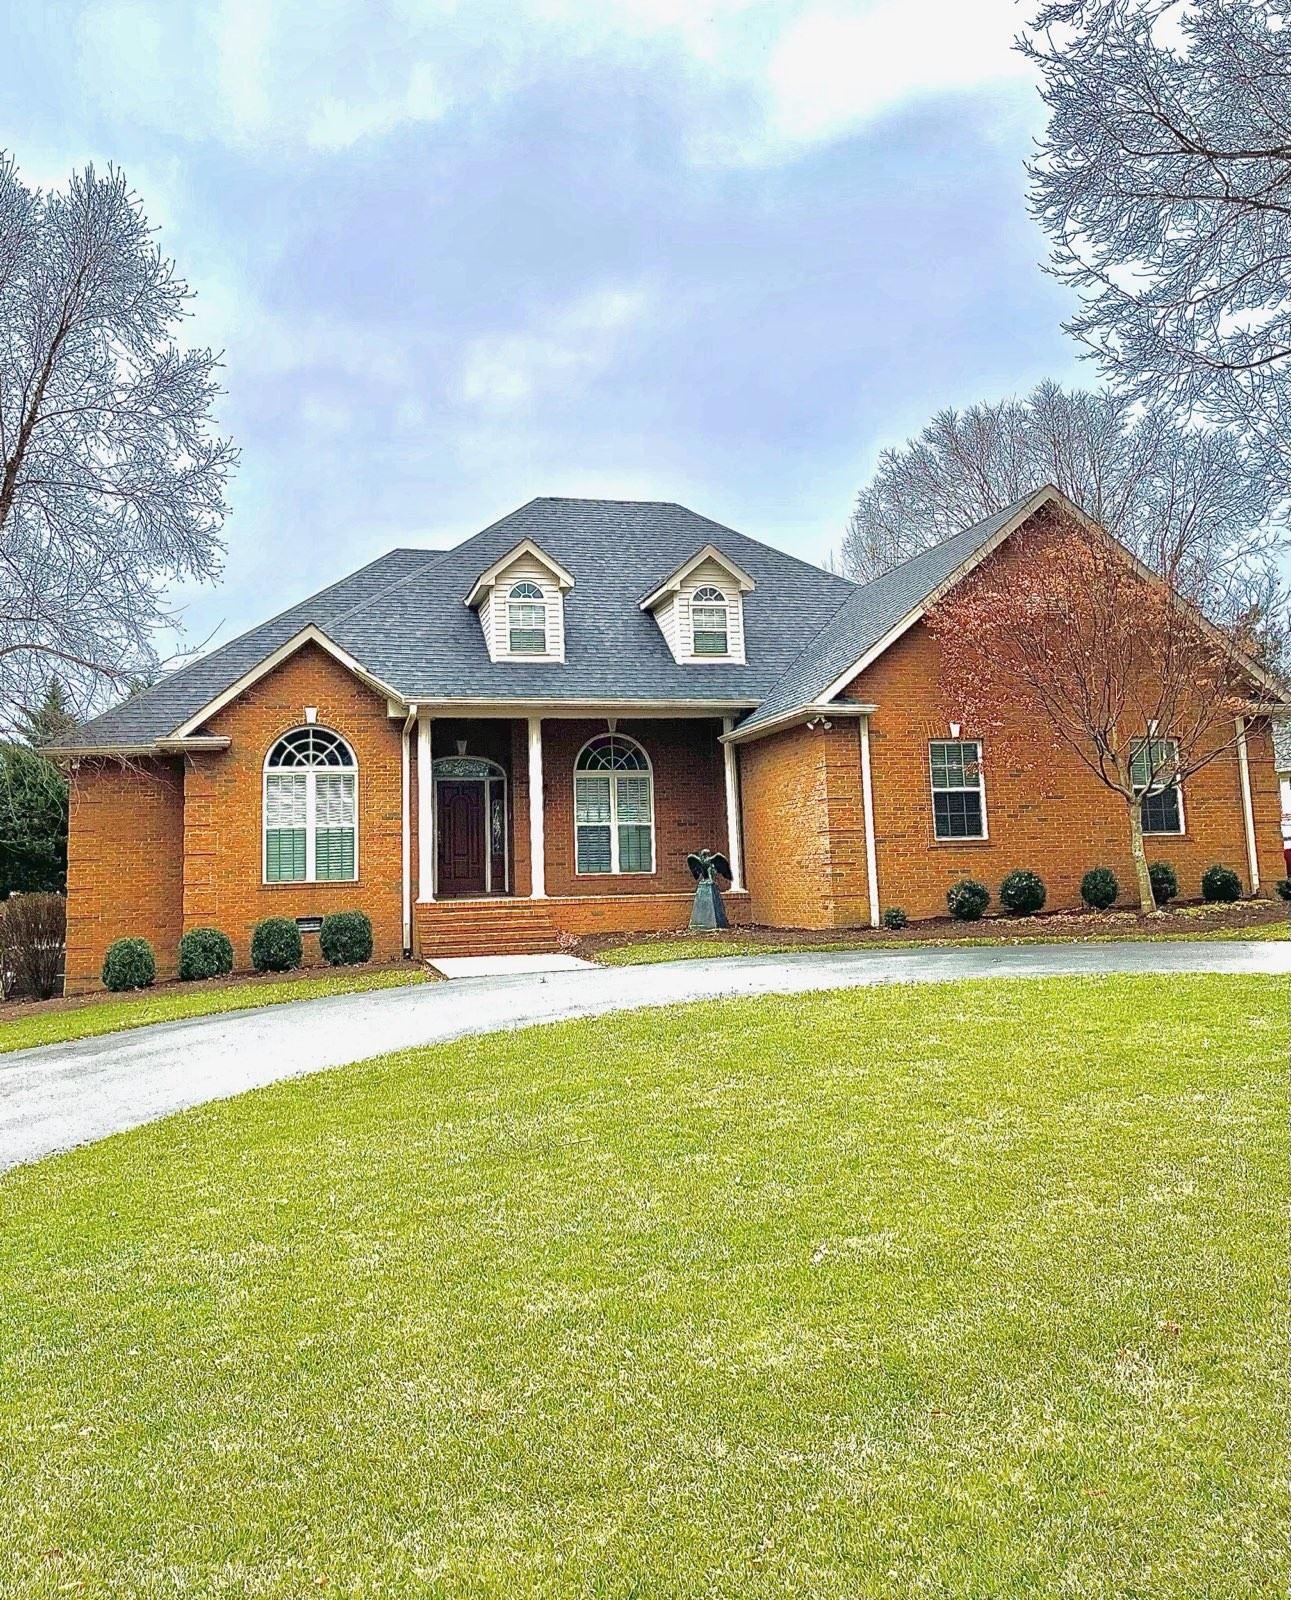 1511 Barnes Dr, Cookeville, TN 38501 - MLS#: 2219210